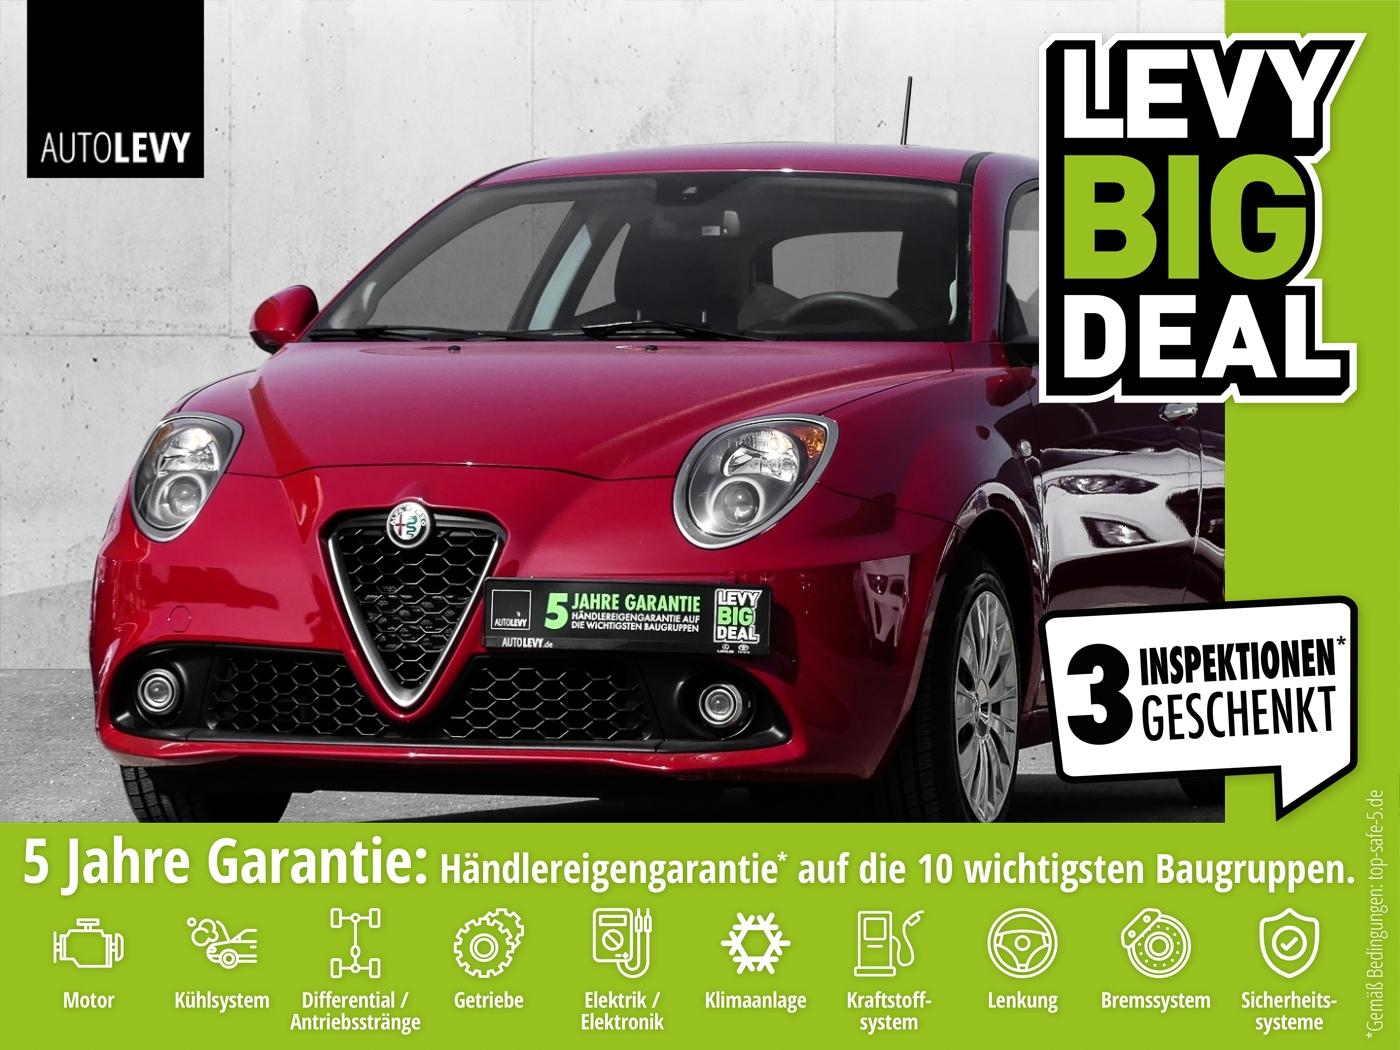 Alfa Romeo MITO 1.4 8V 3-türig *Klimaanlage*Radio/CD*WKR*, Jahr 2017, Benzin